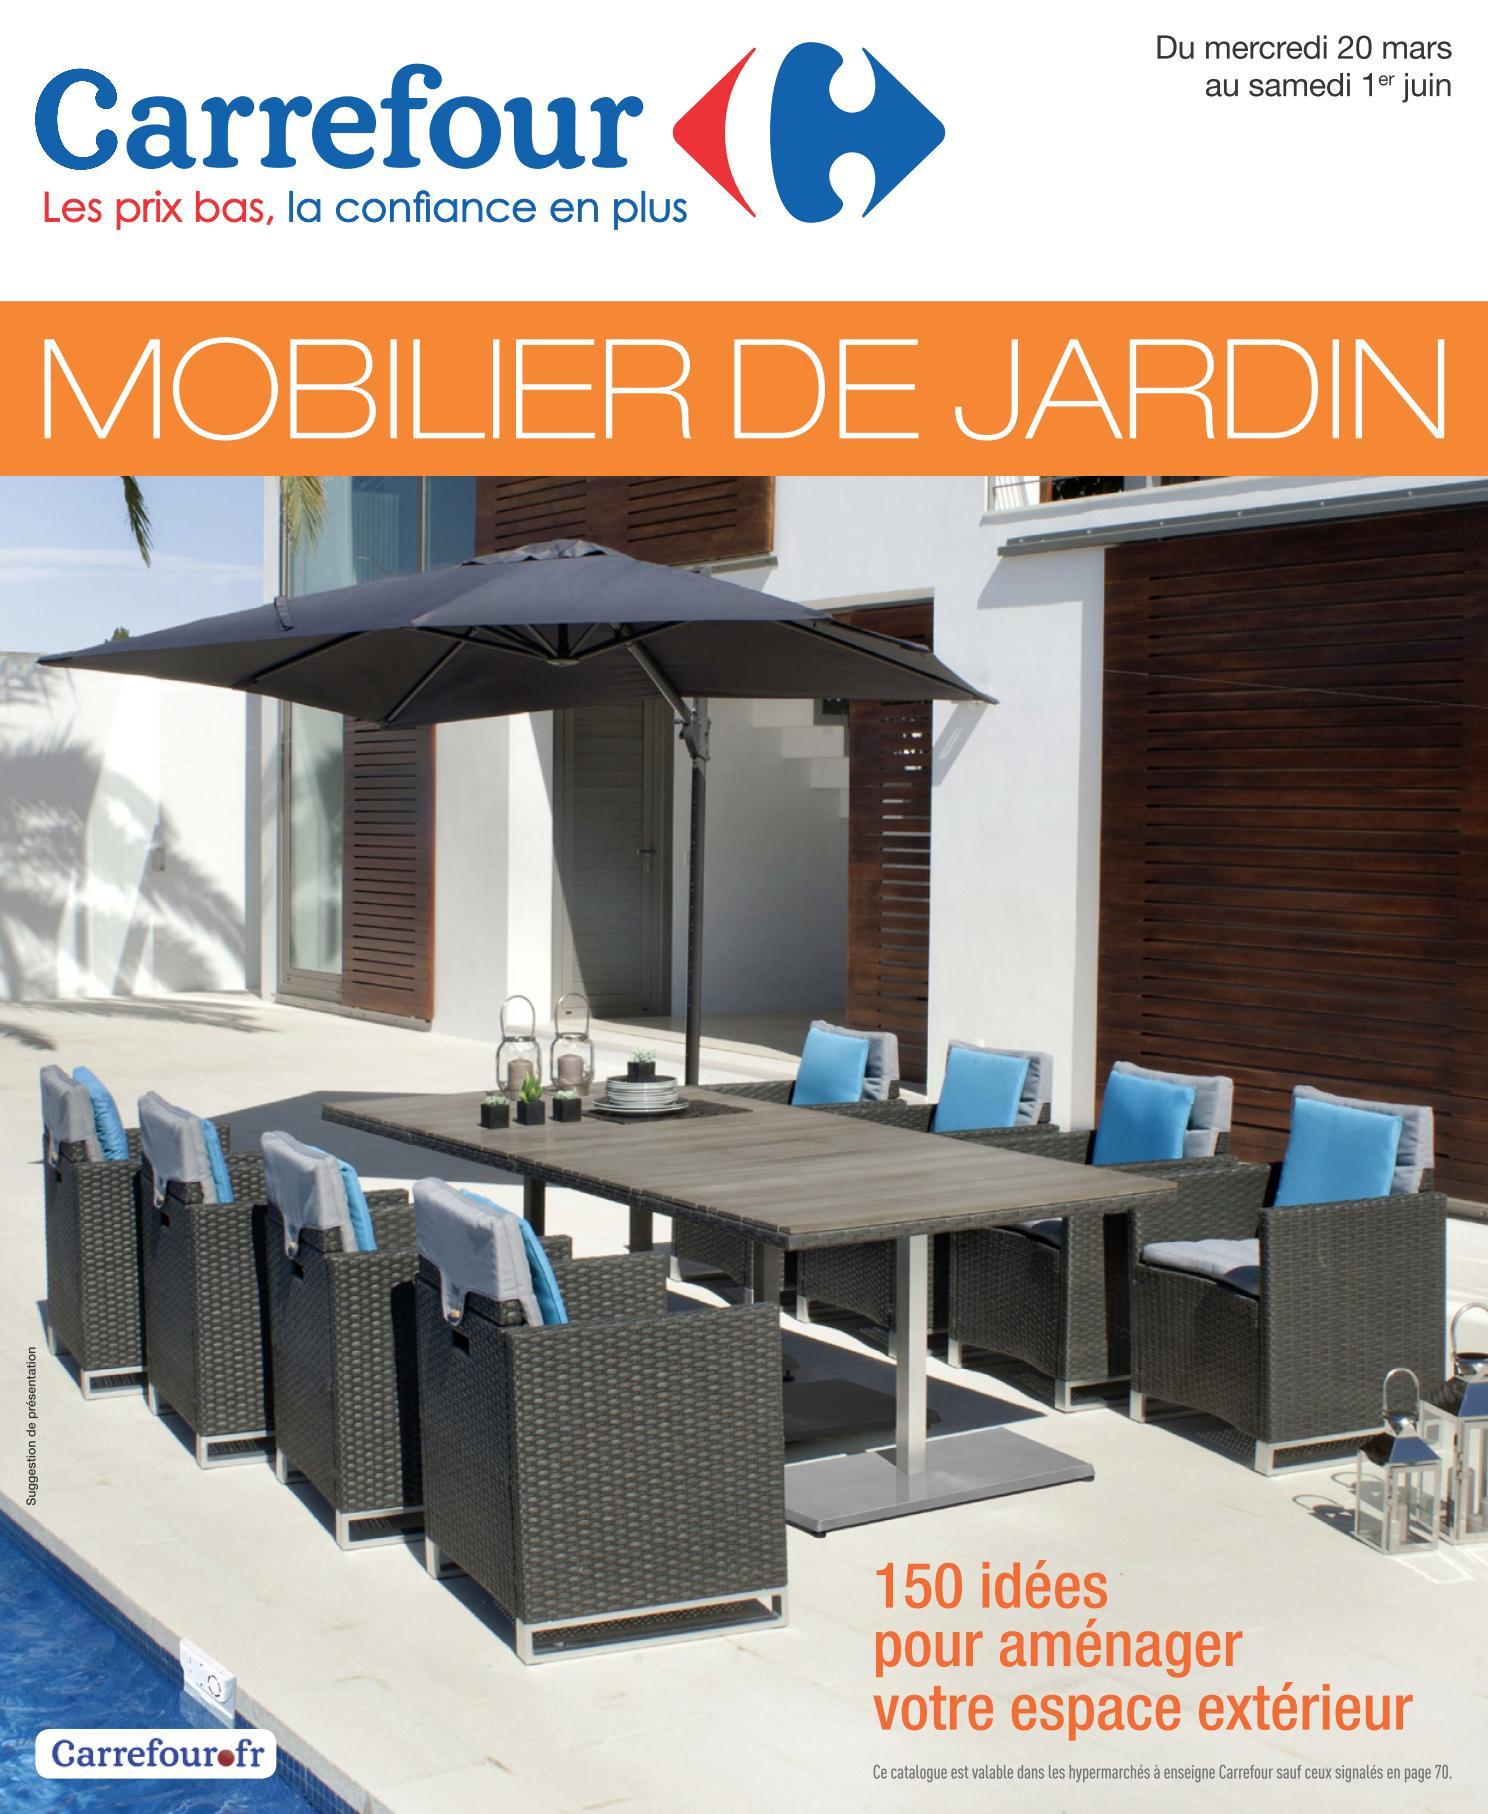 Salon De Jardin A Carrefour - The Best Undercut Ponytail destiné Salon Jardin Resine Carrefour